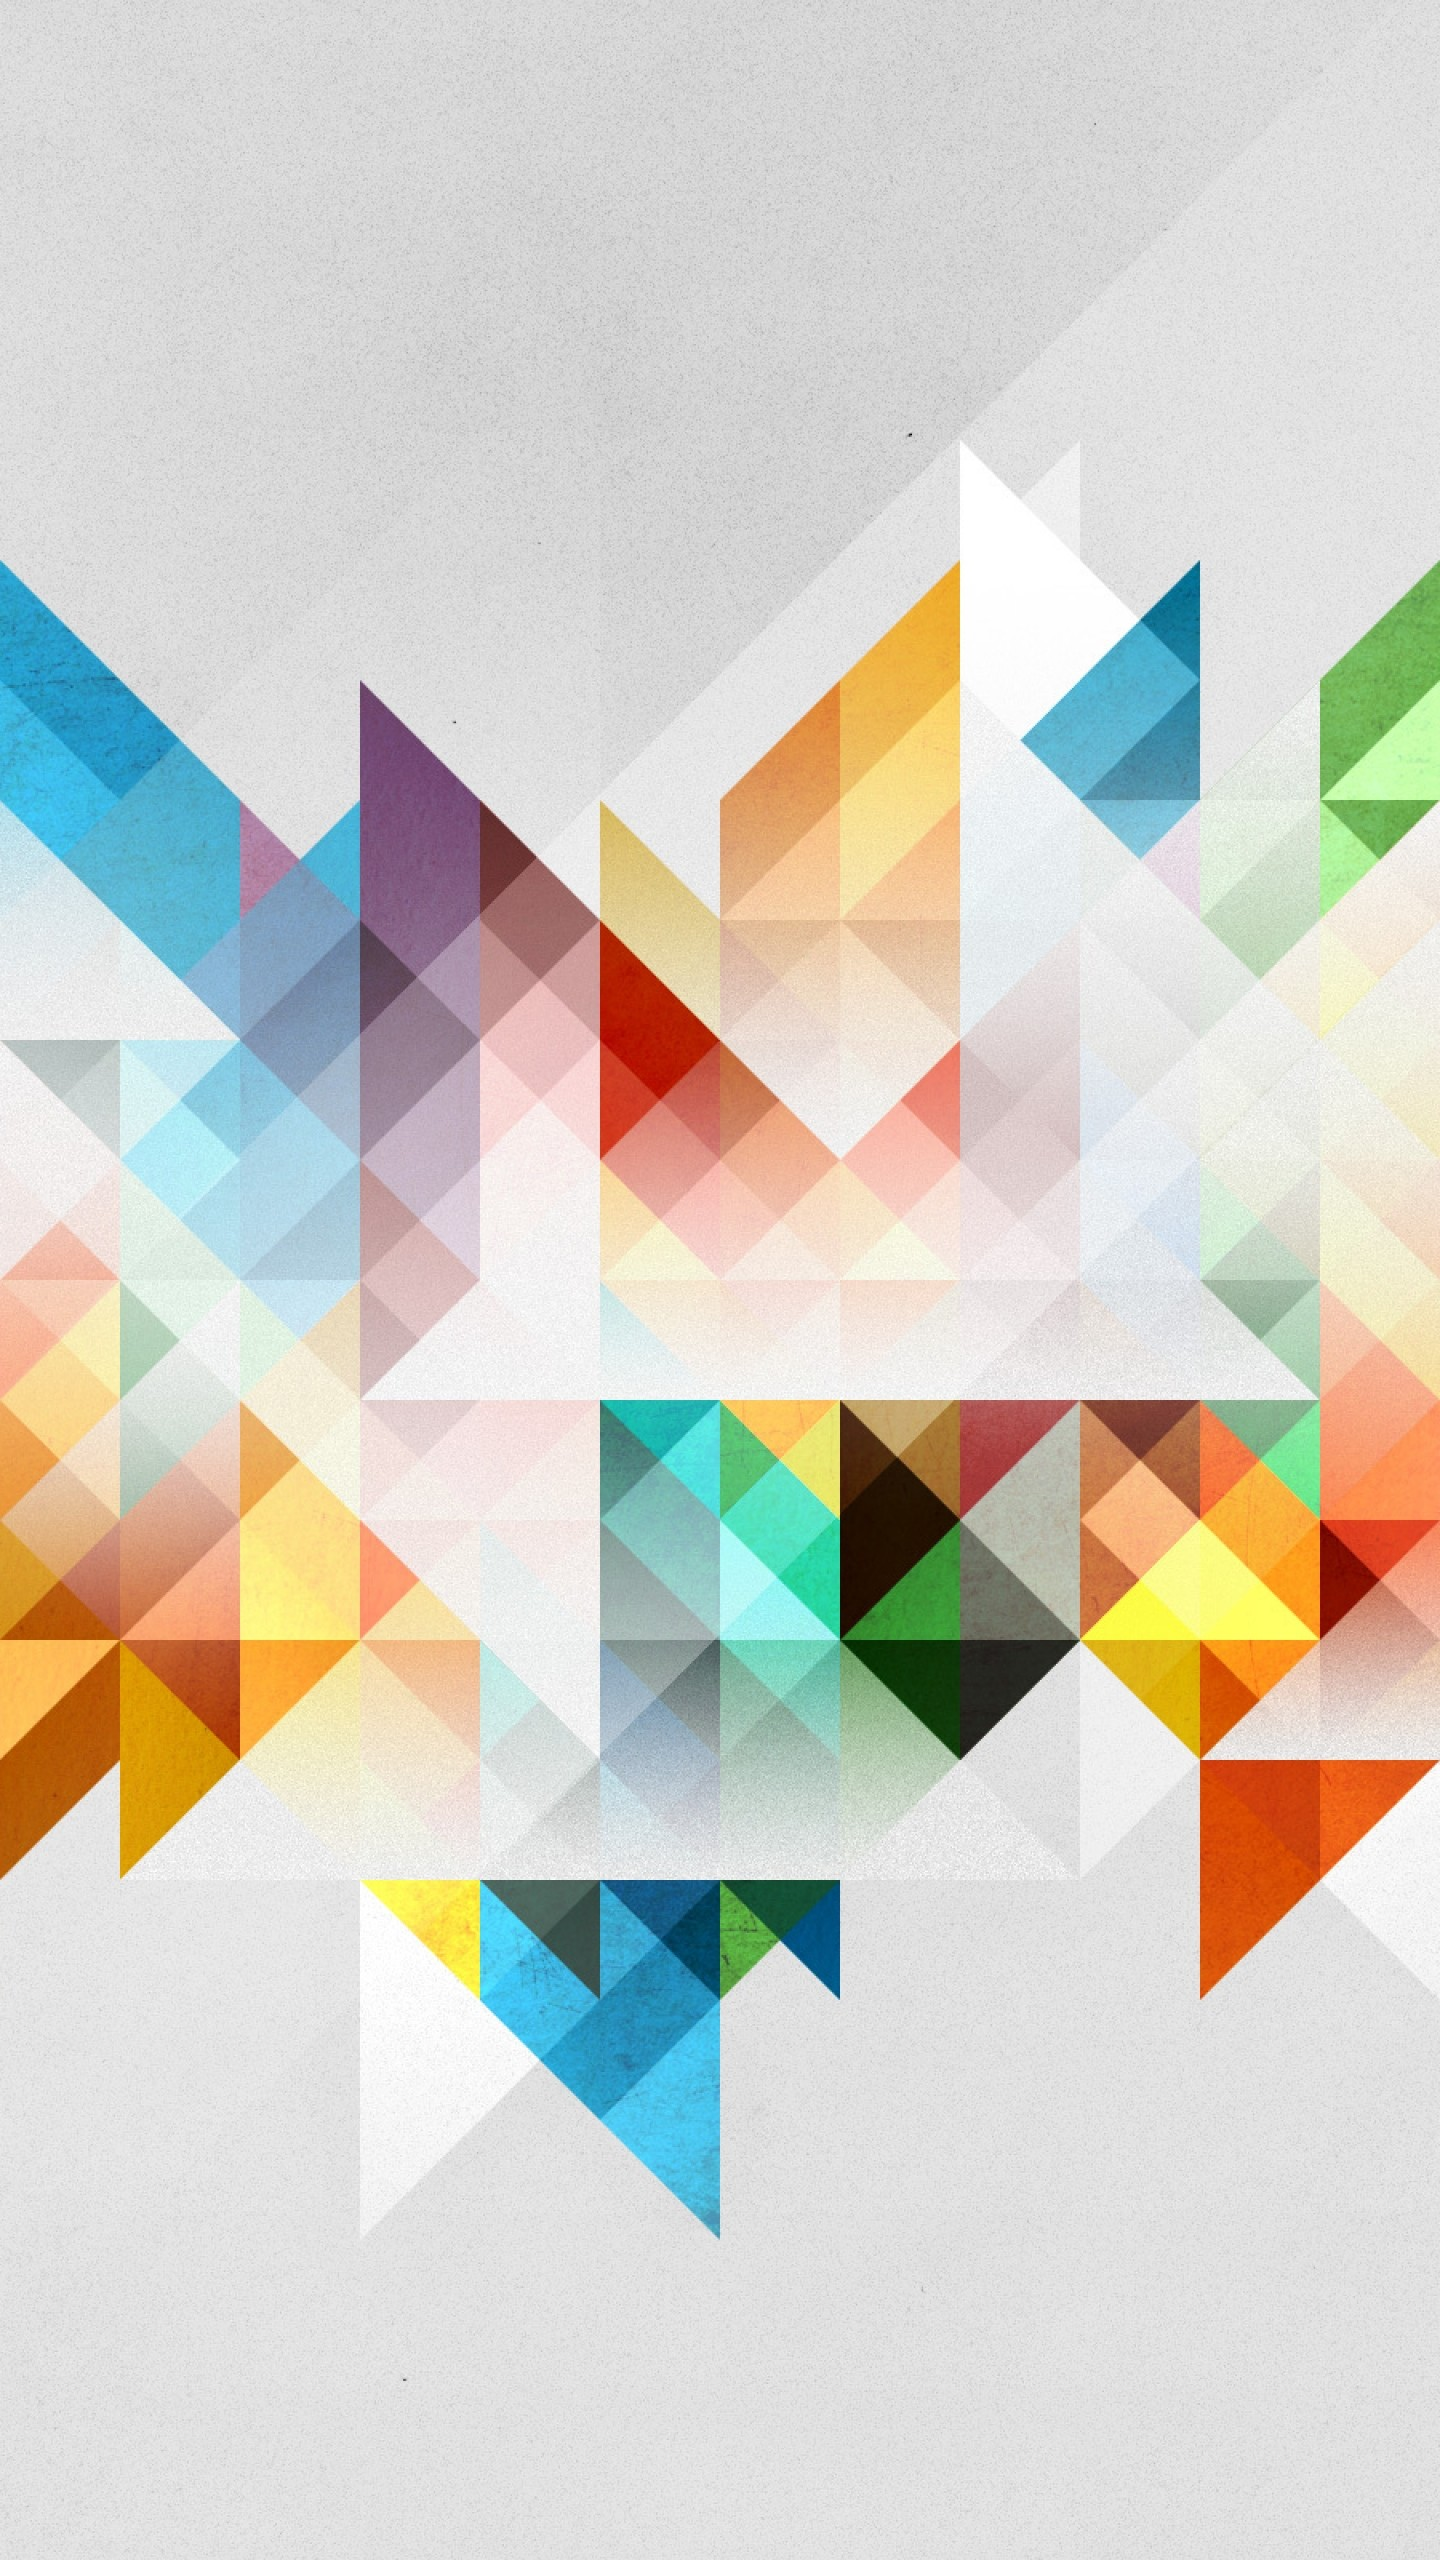 Geometric Shapes Wallpaper (68+ images)